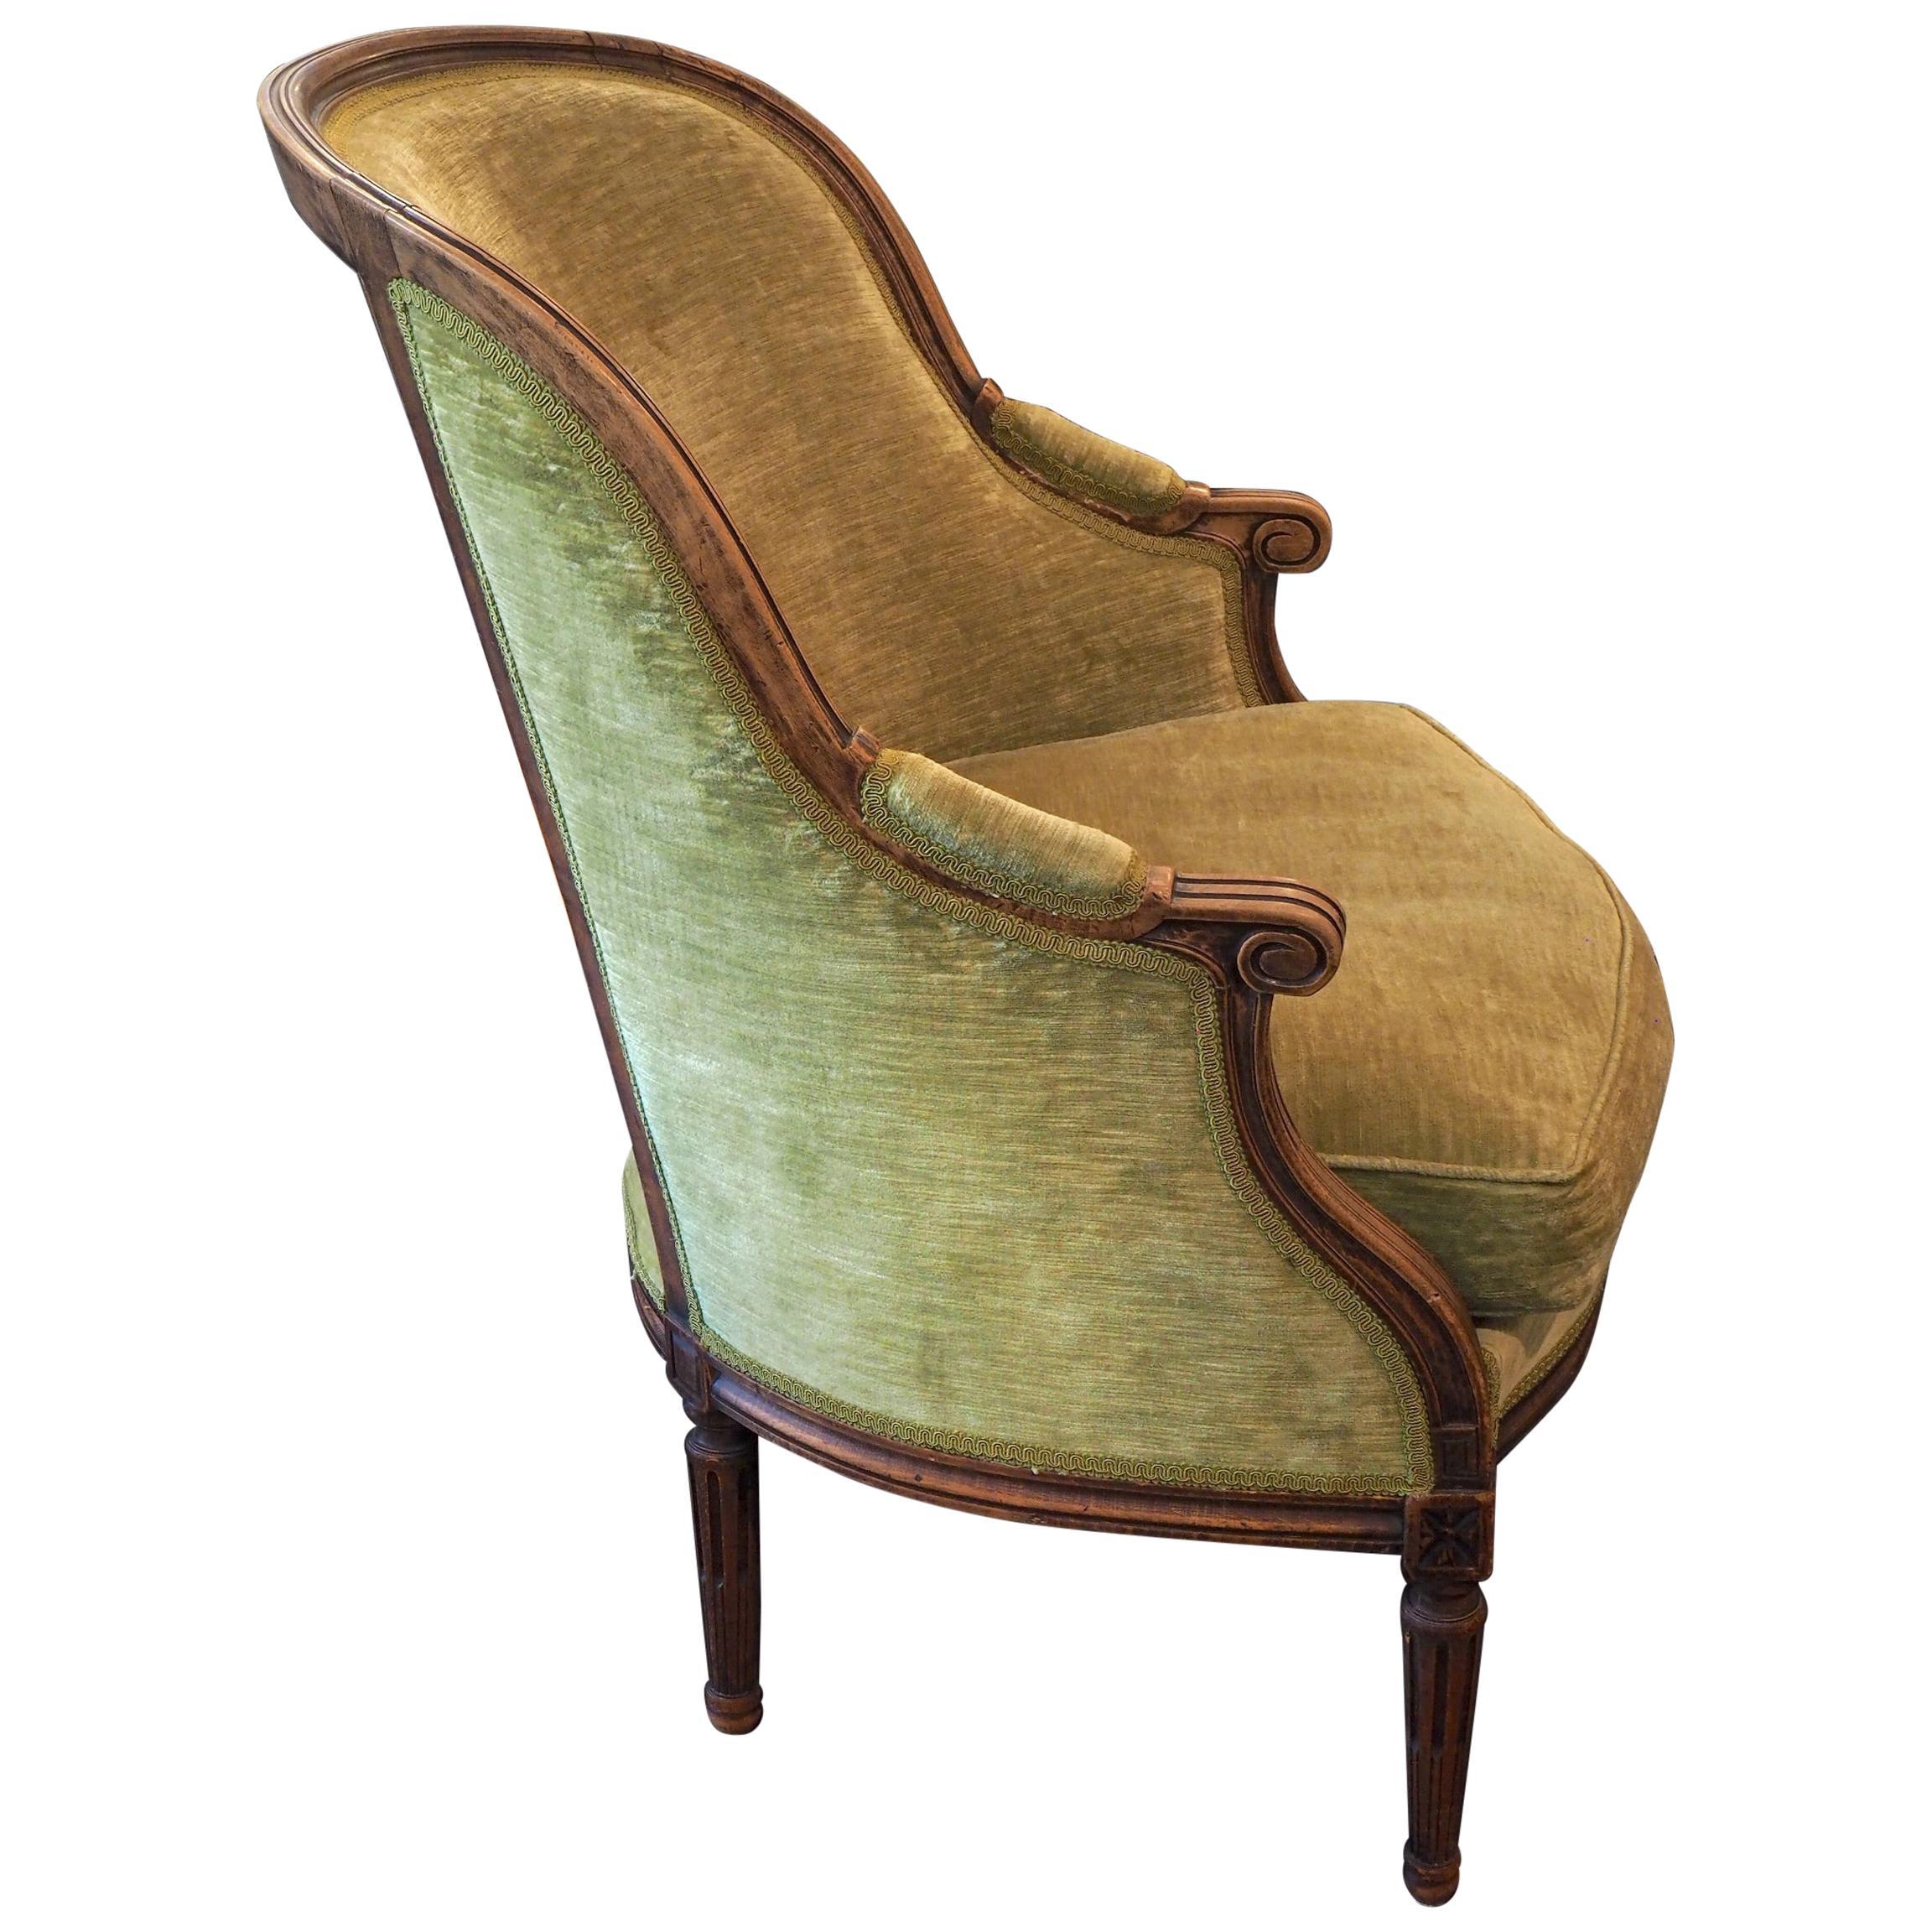 French Louis XVI Style Bergère Armchair Upholstered Green Velvet, 19th Century